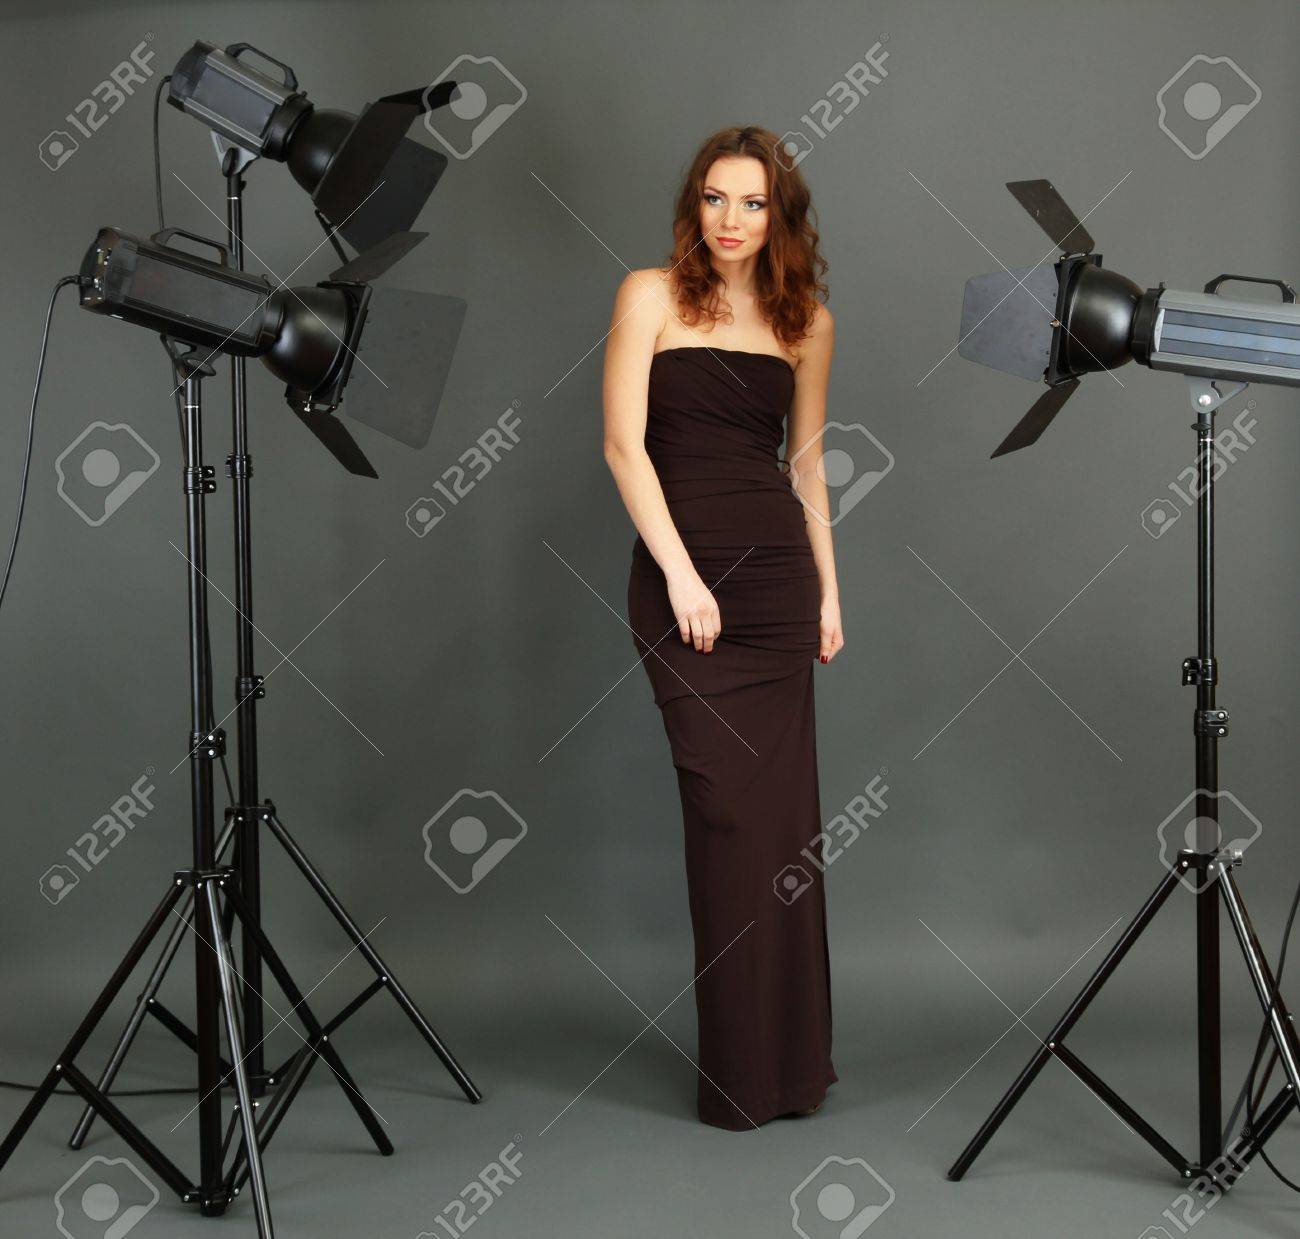 Beautiful professional female model resting between shots in photography studio shoot set-up Stock Photo - 18040022